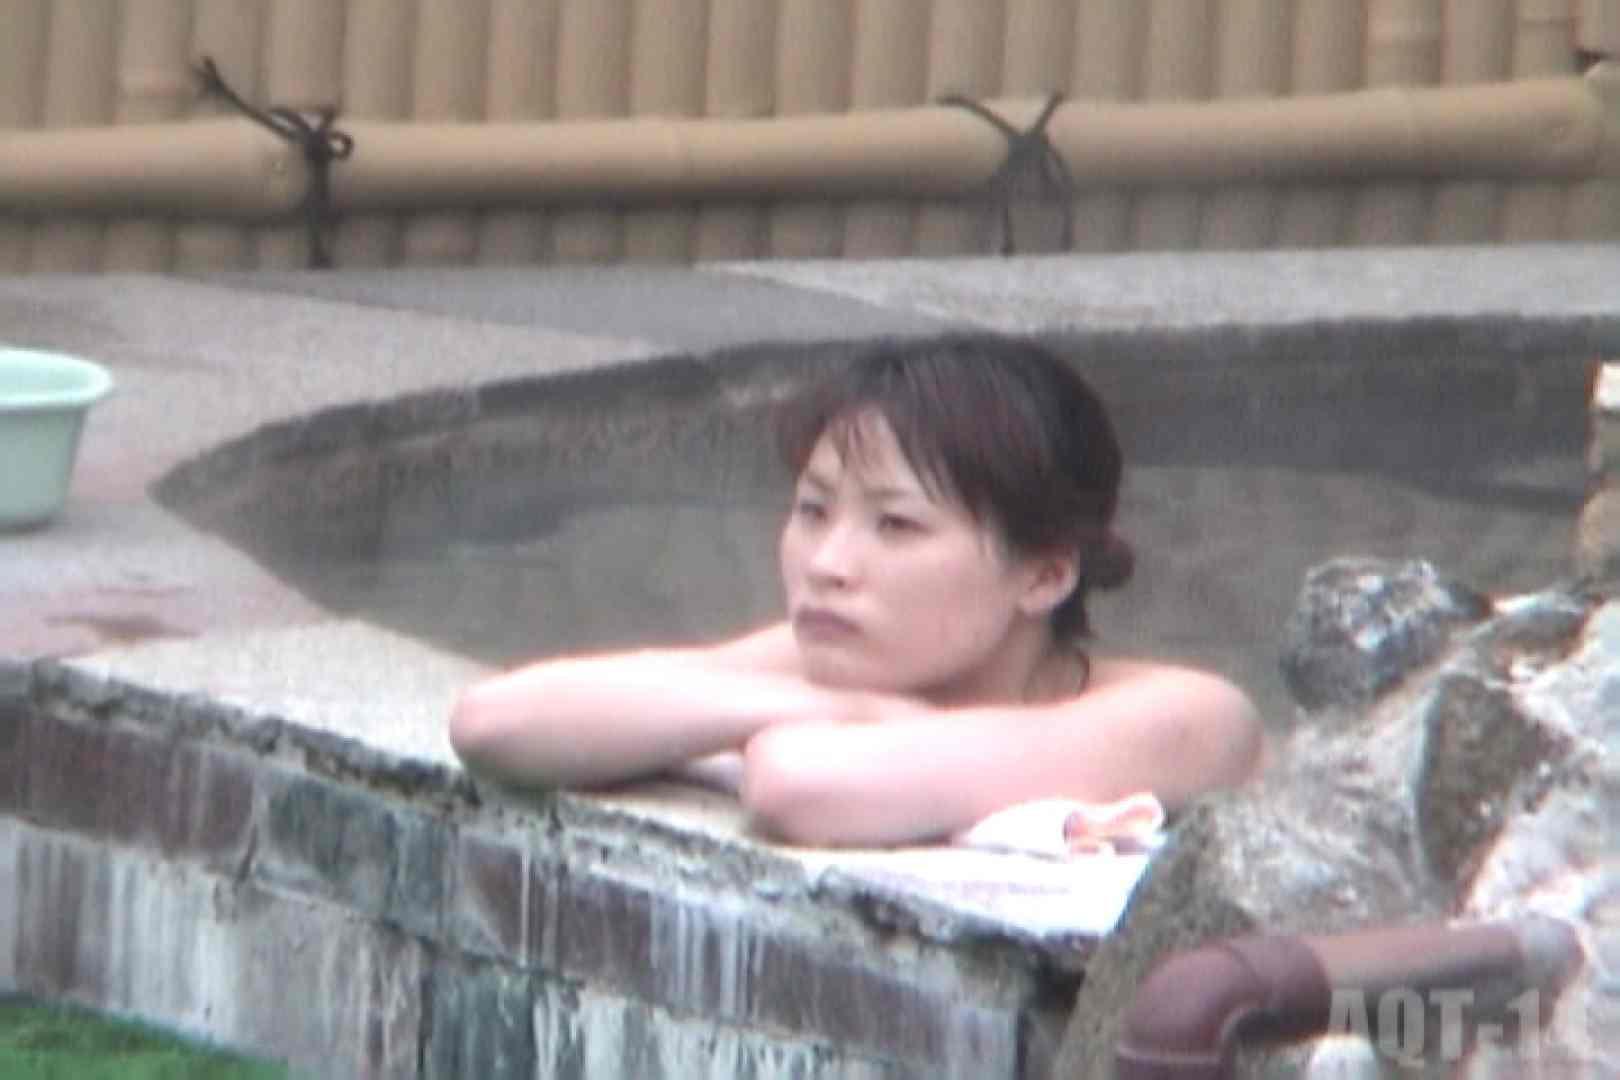 Aquaな露天風呂Vol.822 盗撮師作品 SEX無修正画像 75pic 2